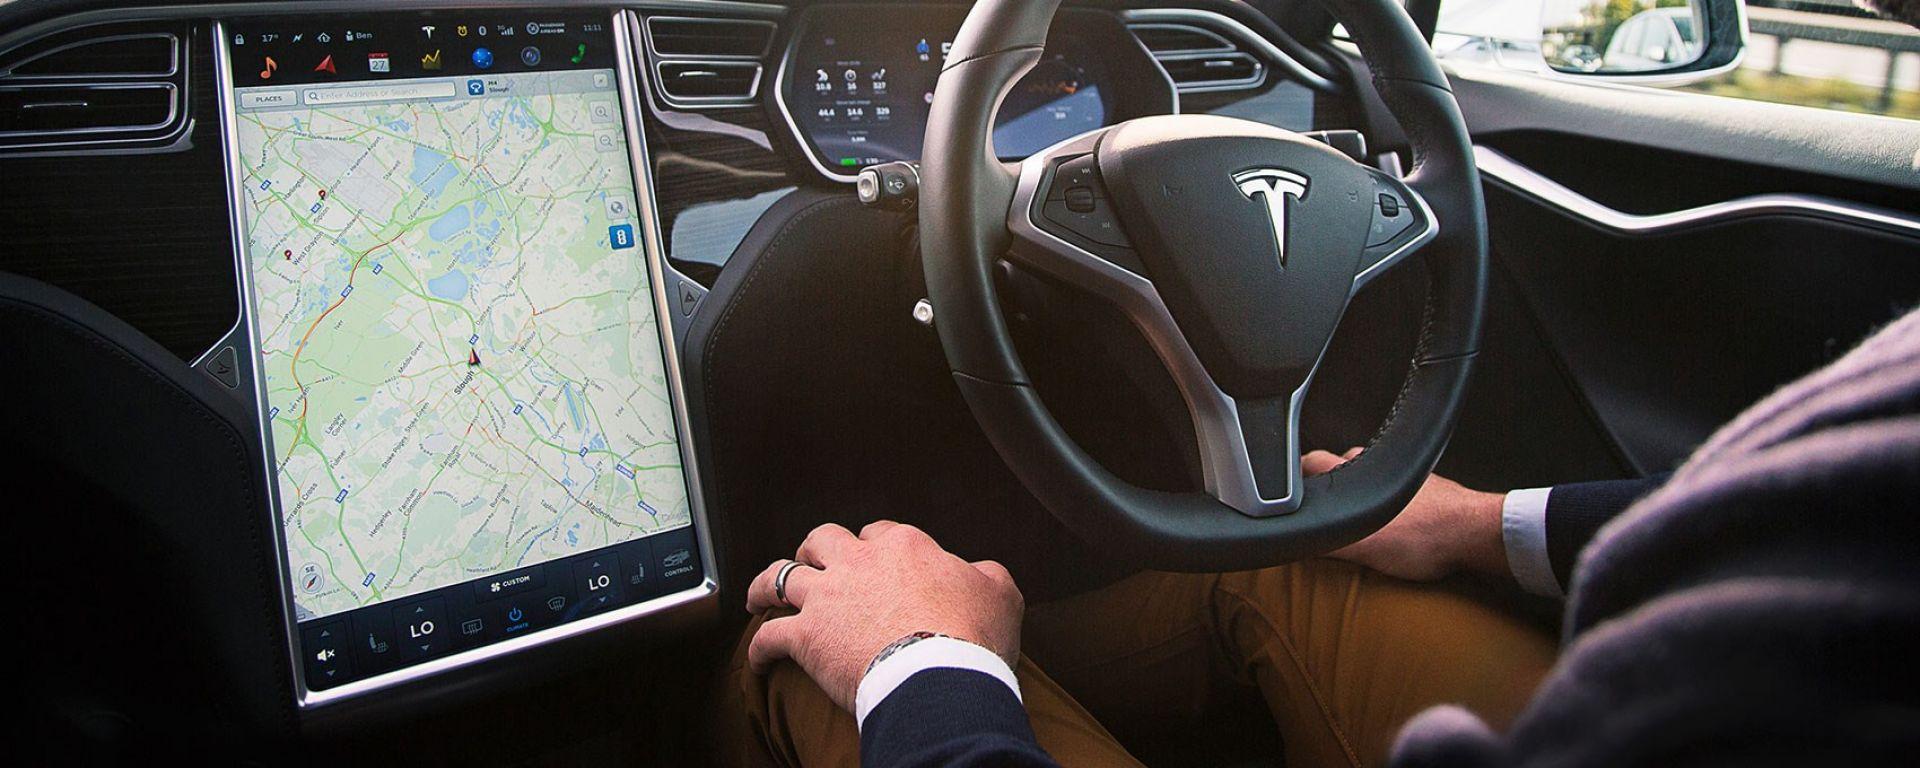 Il sistema Autopilot di Tesla